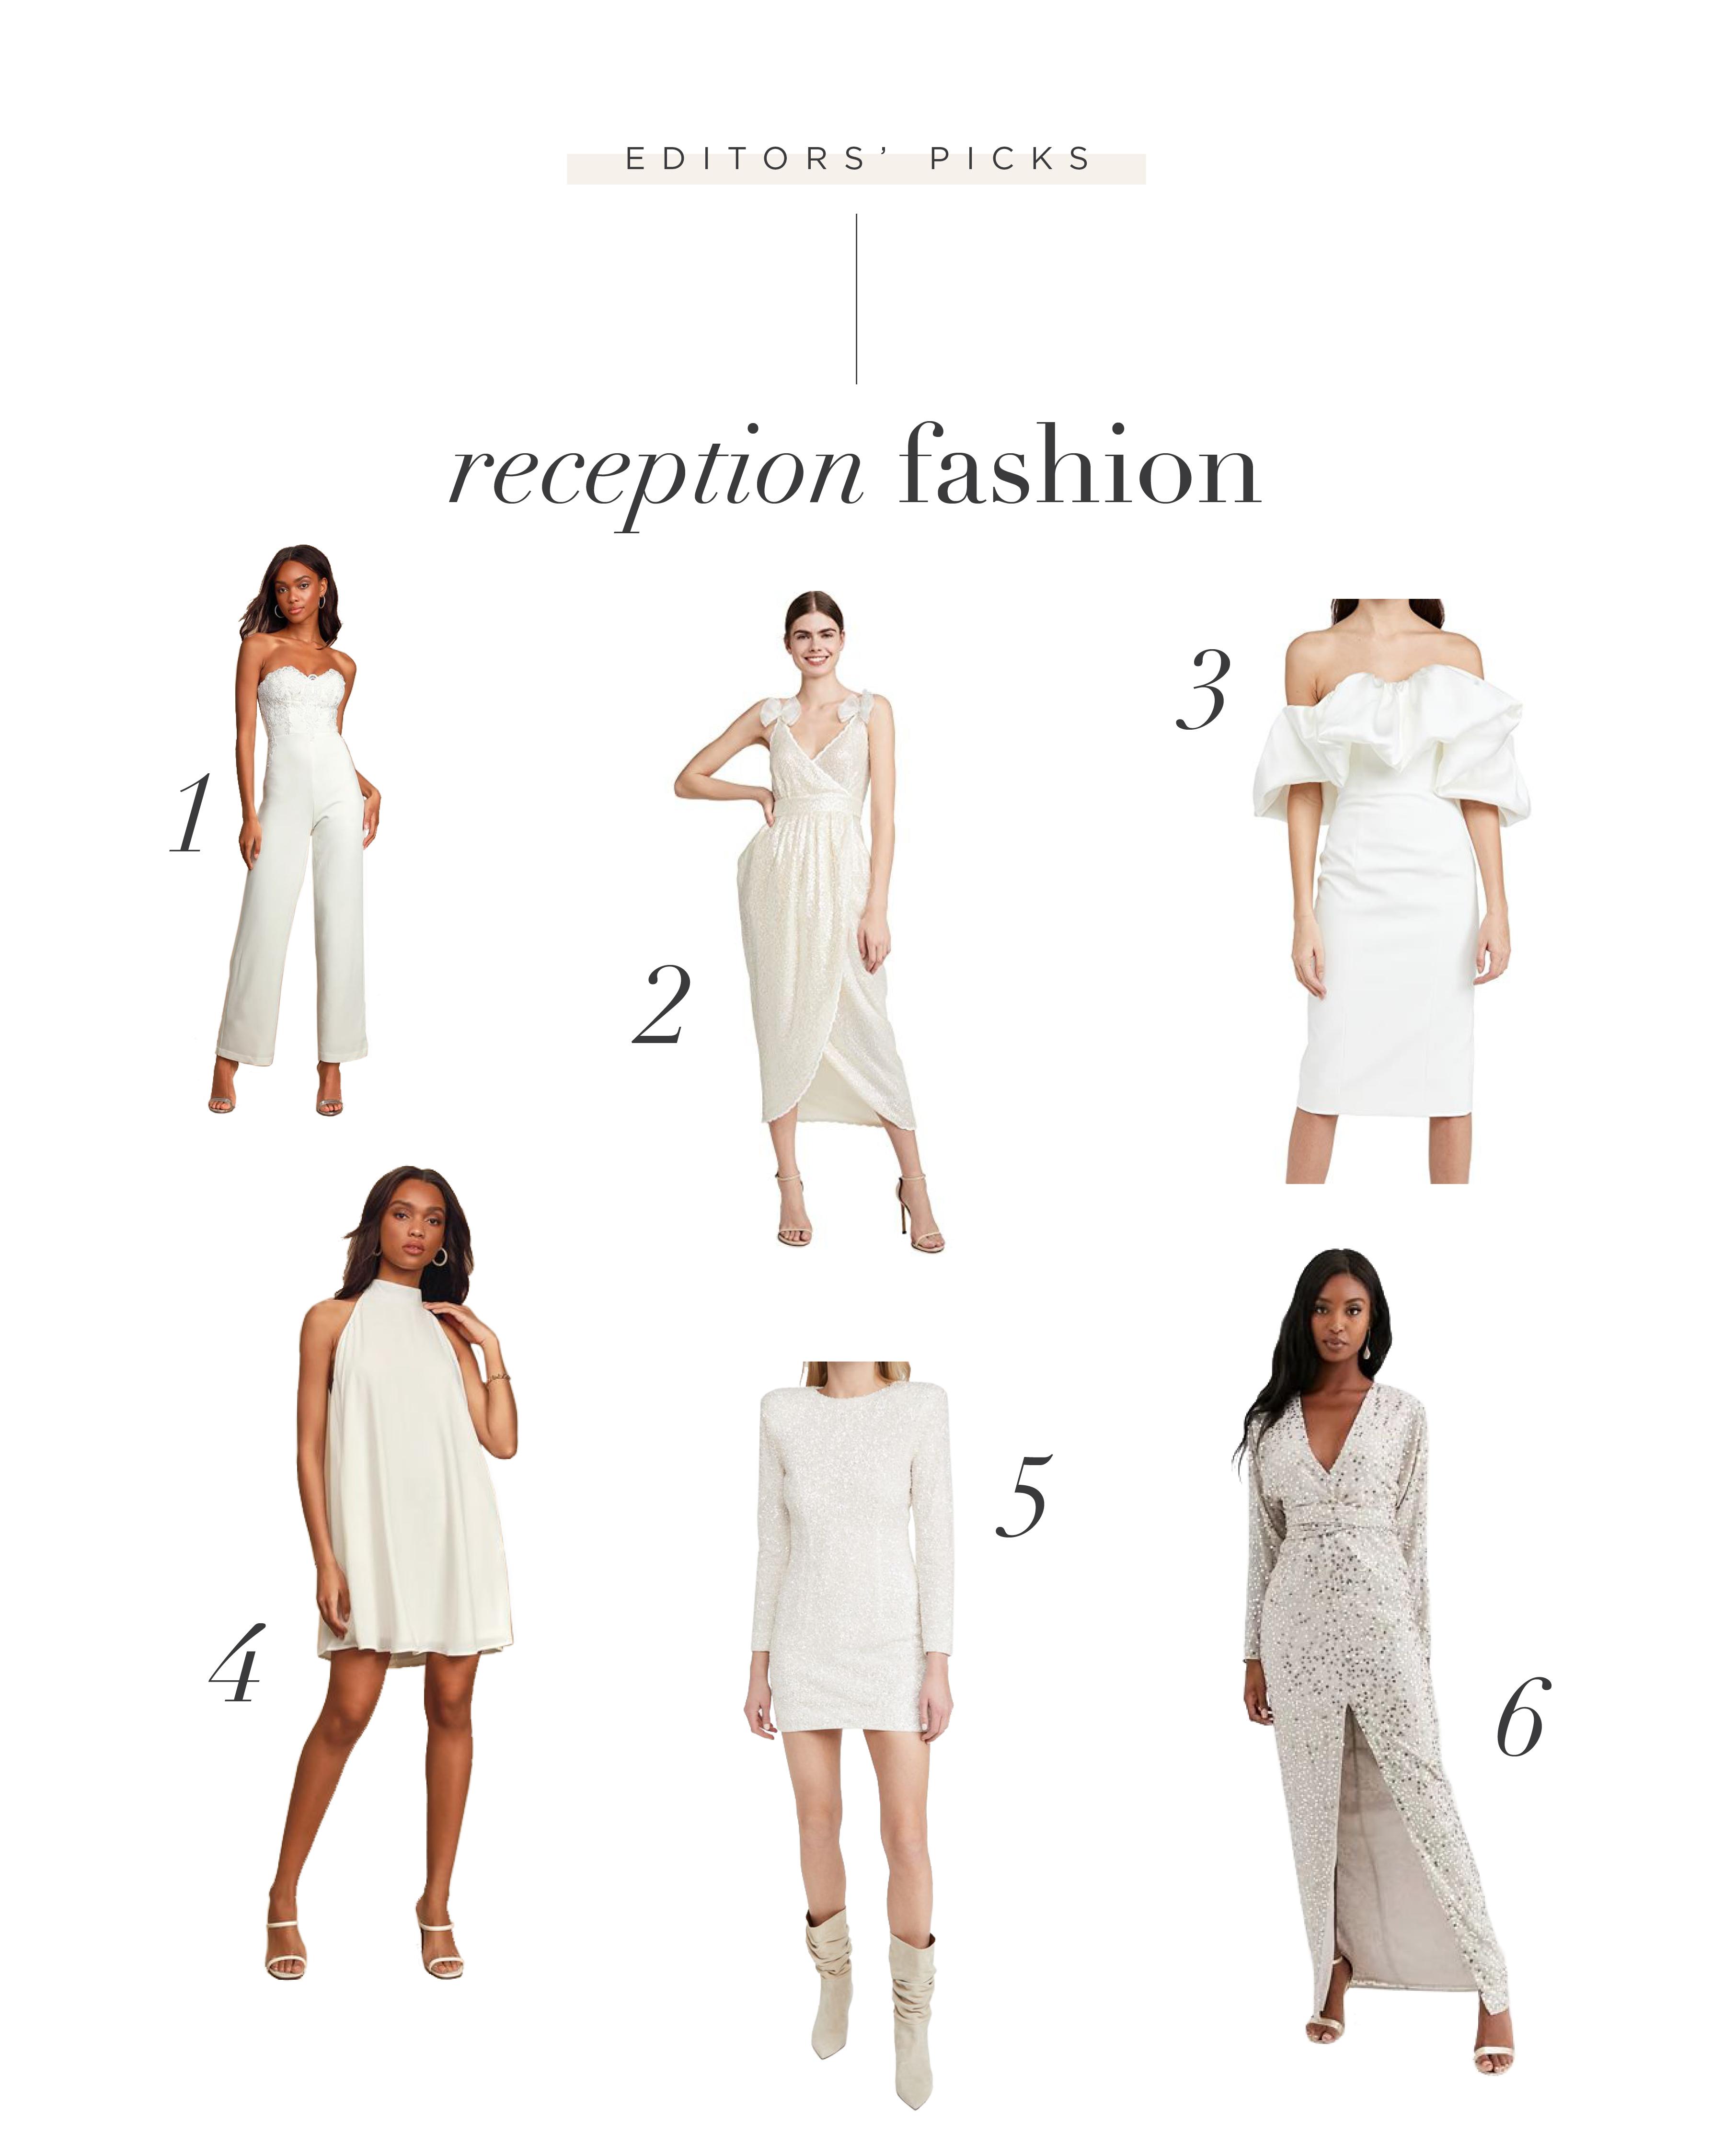 Choosing the Perfect Wedding Reception Fashion + Exit Attire